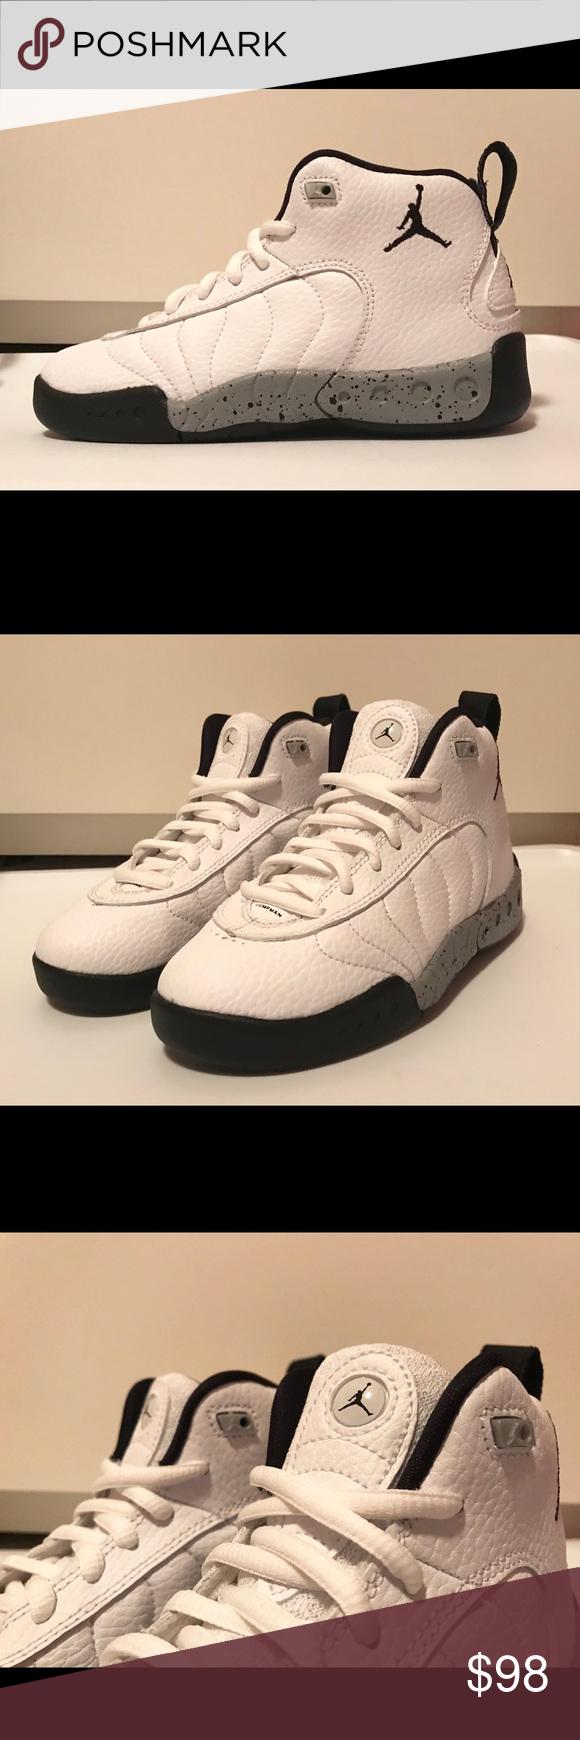 4baca68592e7bc Air Jordan Jumpman Pro (PS) Kids Sz 12.5 Youth Air Jordan Jumpman Pro (PS)  Kids Sz 12.5 White   Grey   Black Style 909419-103 Youth size 12.5C Jordan  Shoes ...